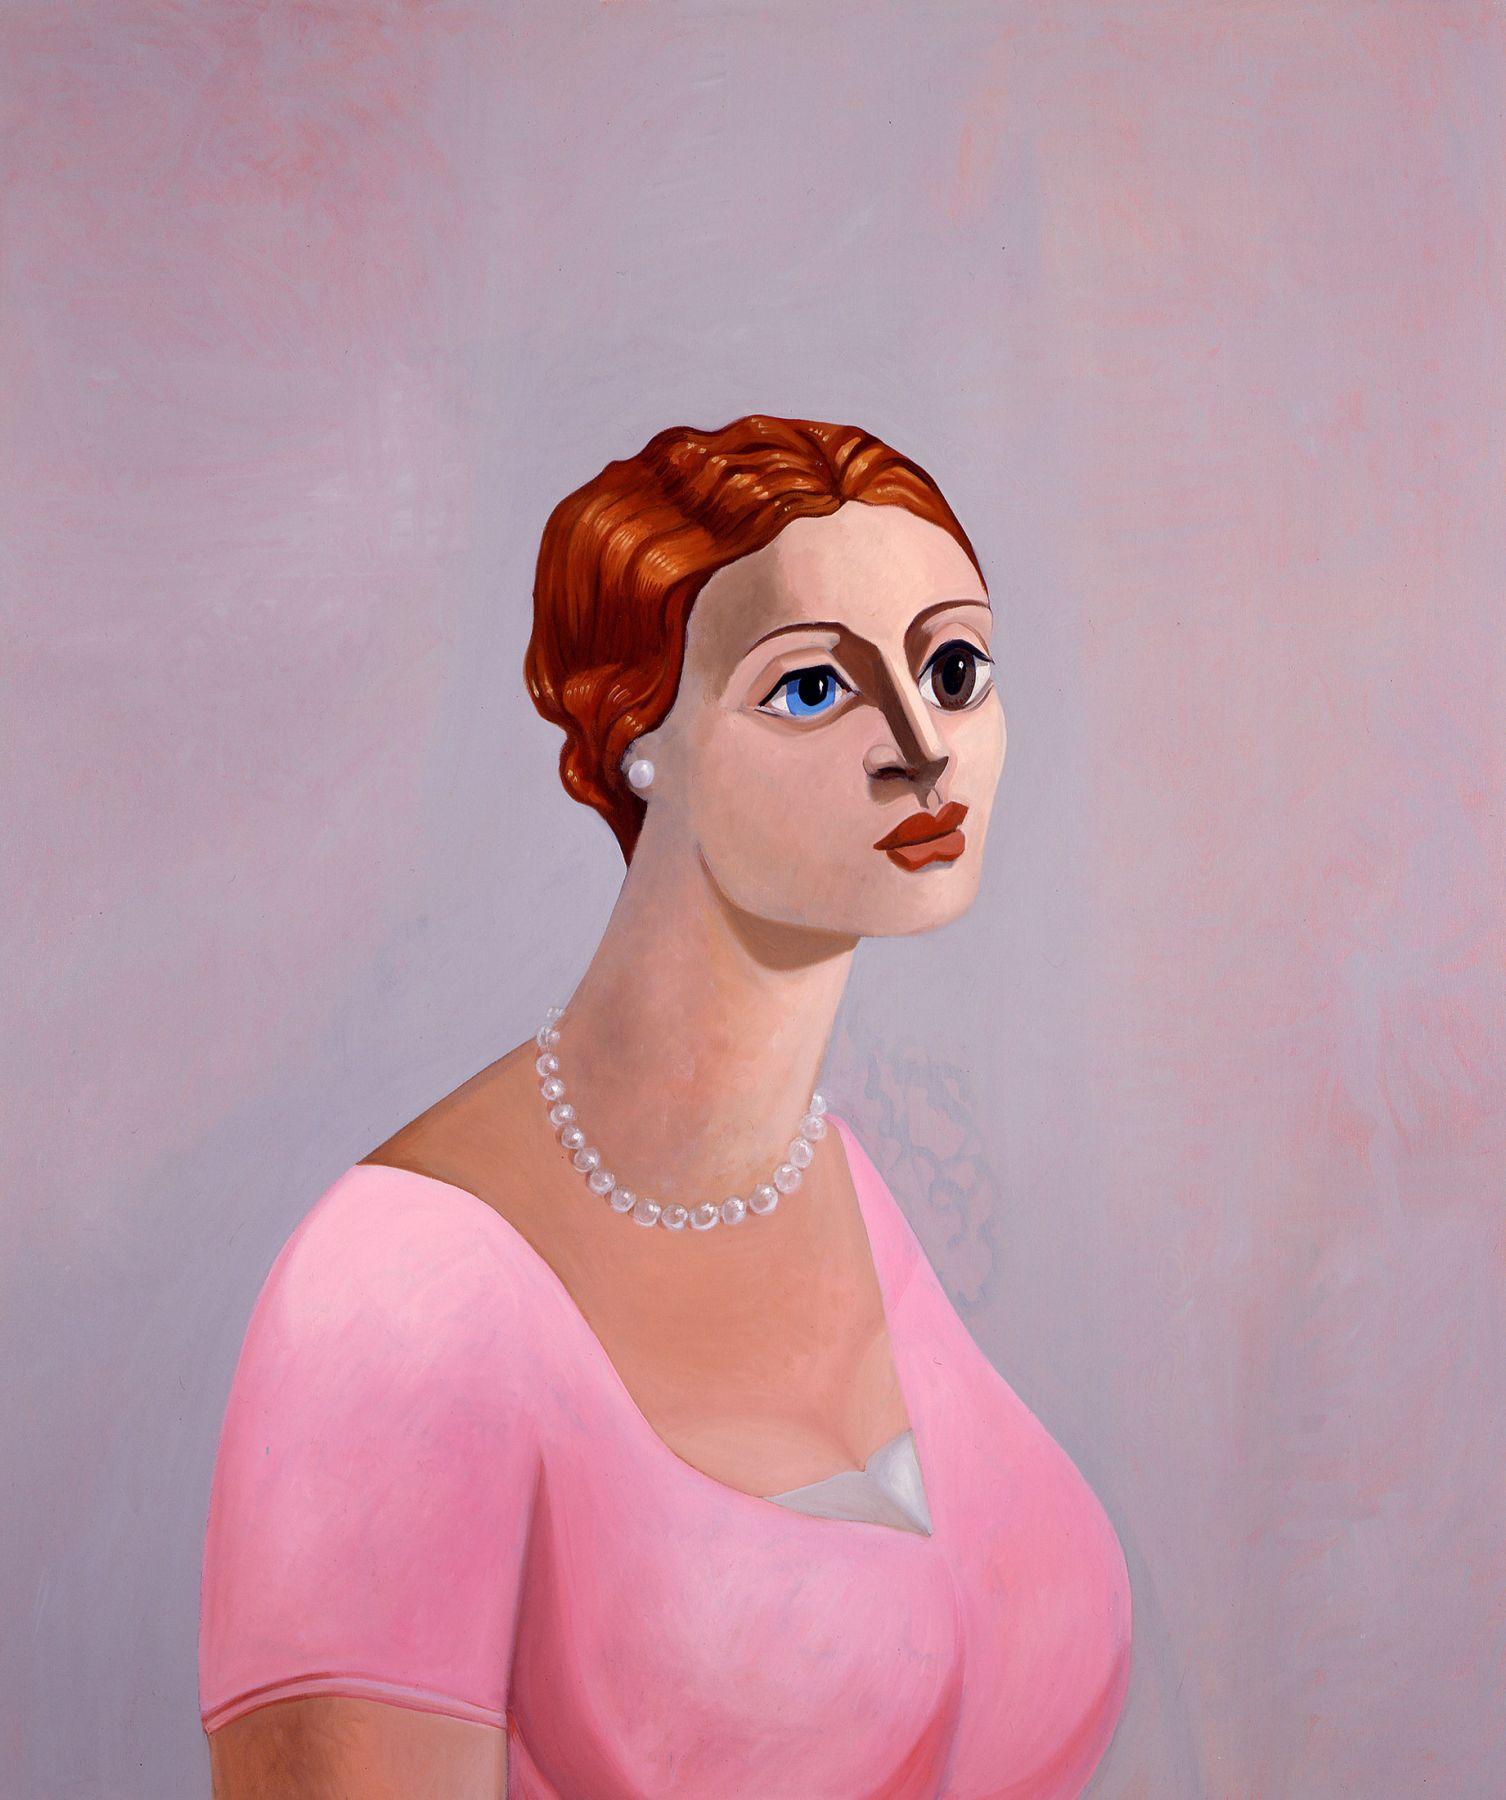 George Condo Portrait of a Woman, 2002